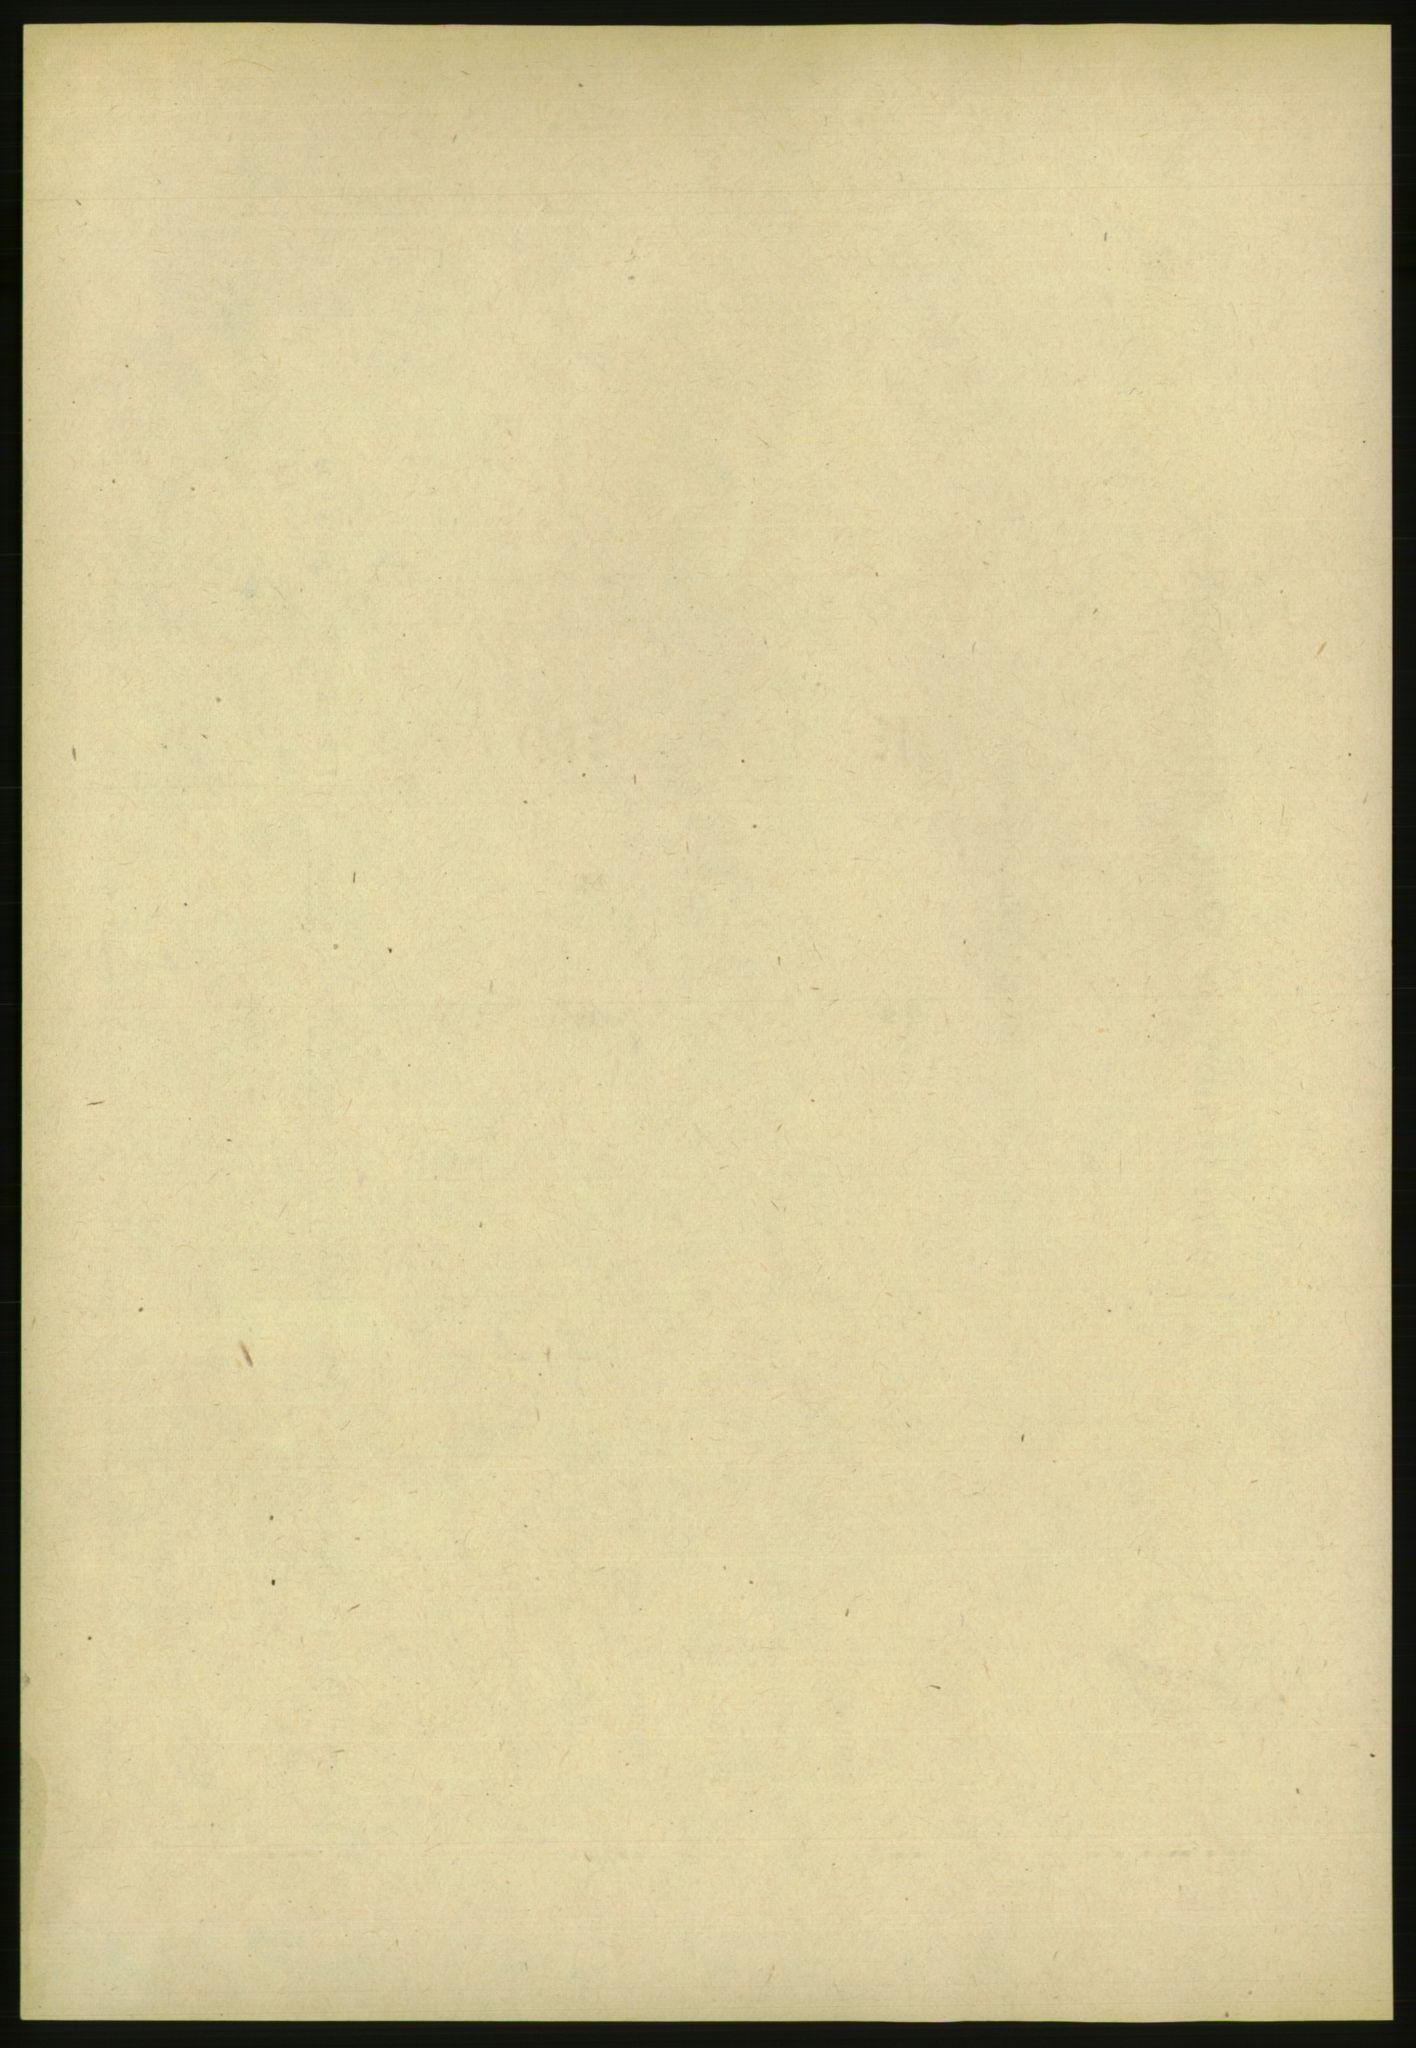 PUBL, Kristiania/Oslo adressebok, 1952